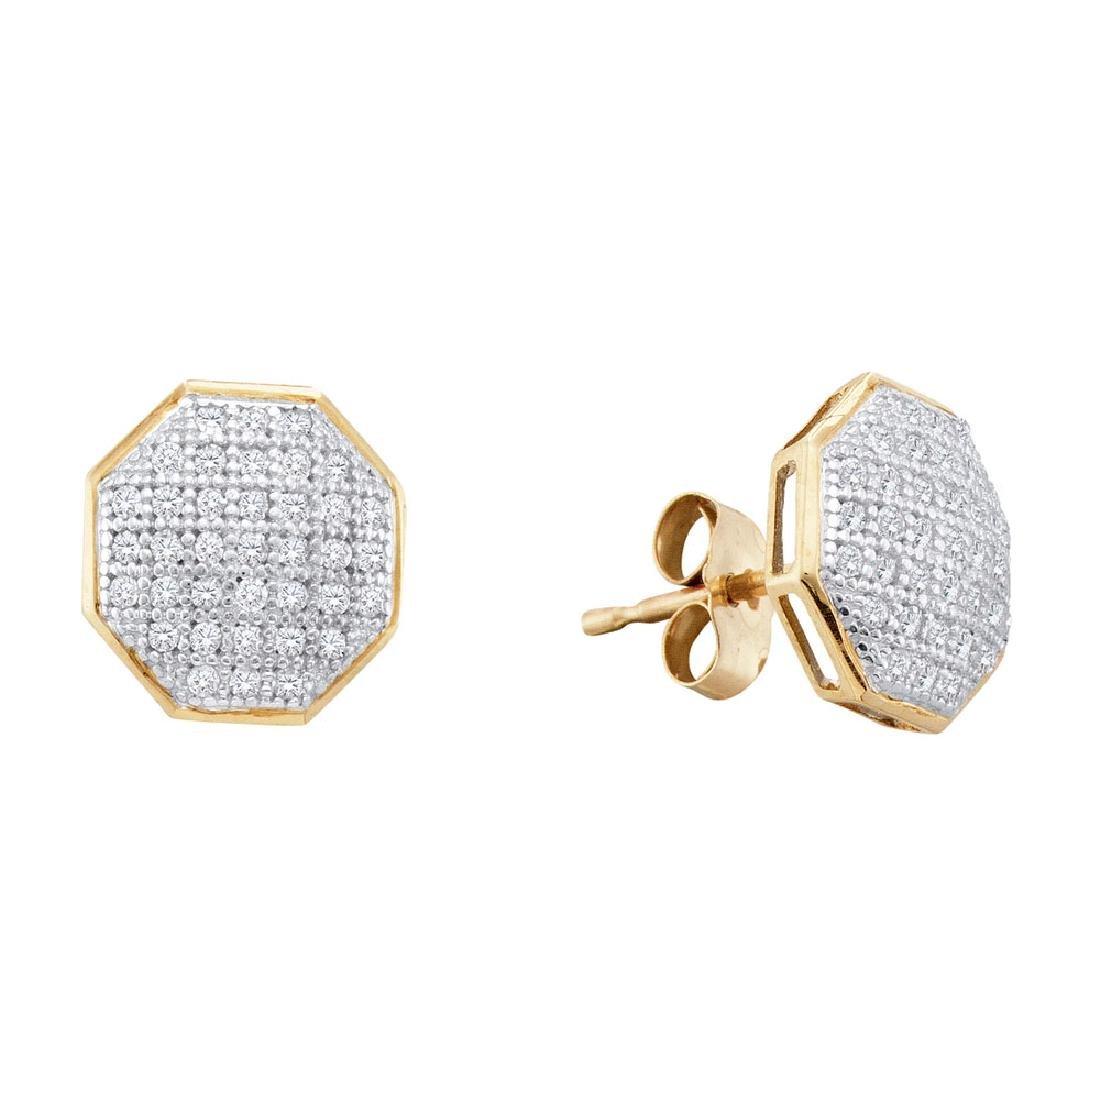 0.20 CTW Diamond Octagon Cluster Earrings 10KT Yellow